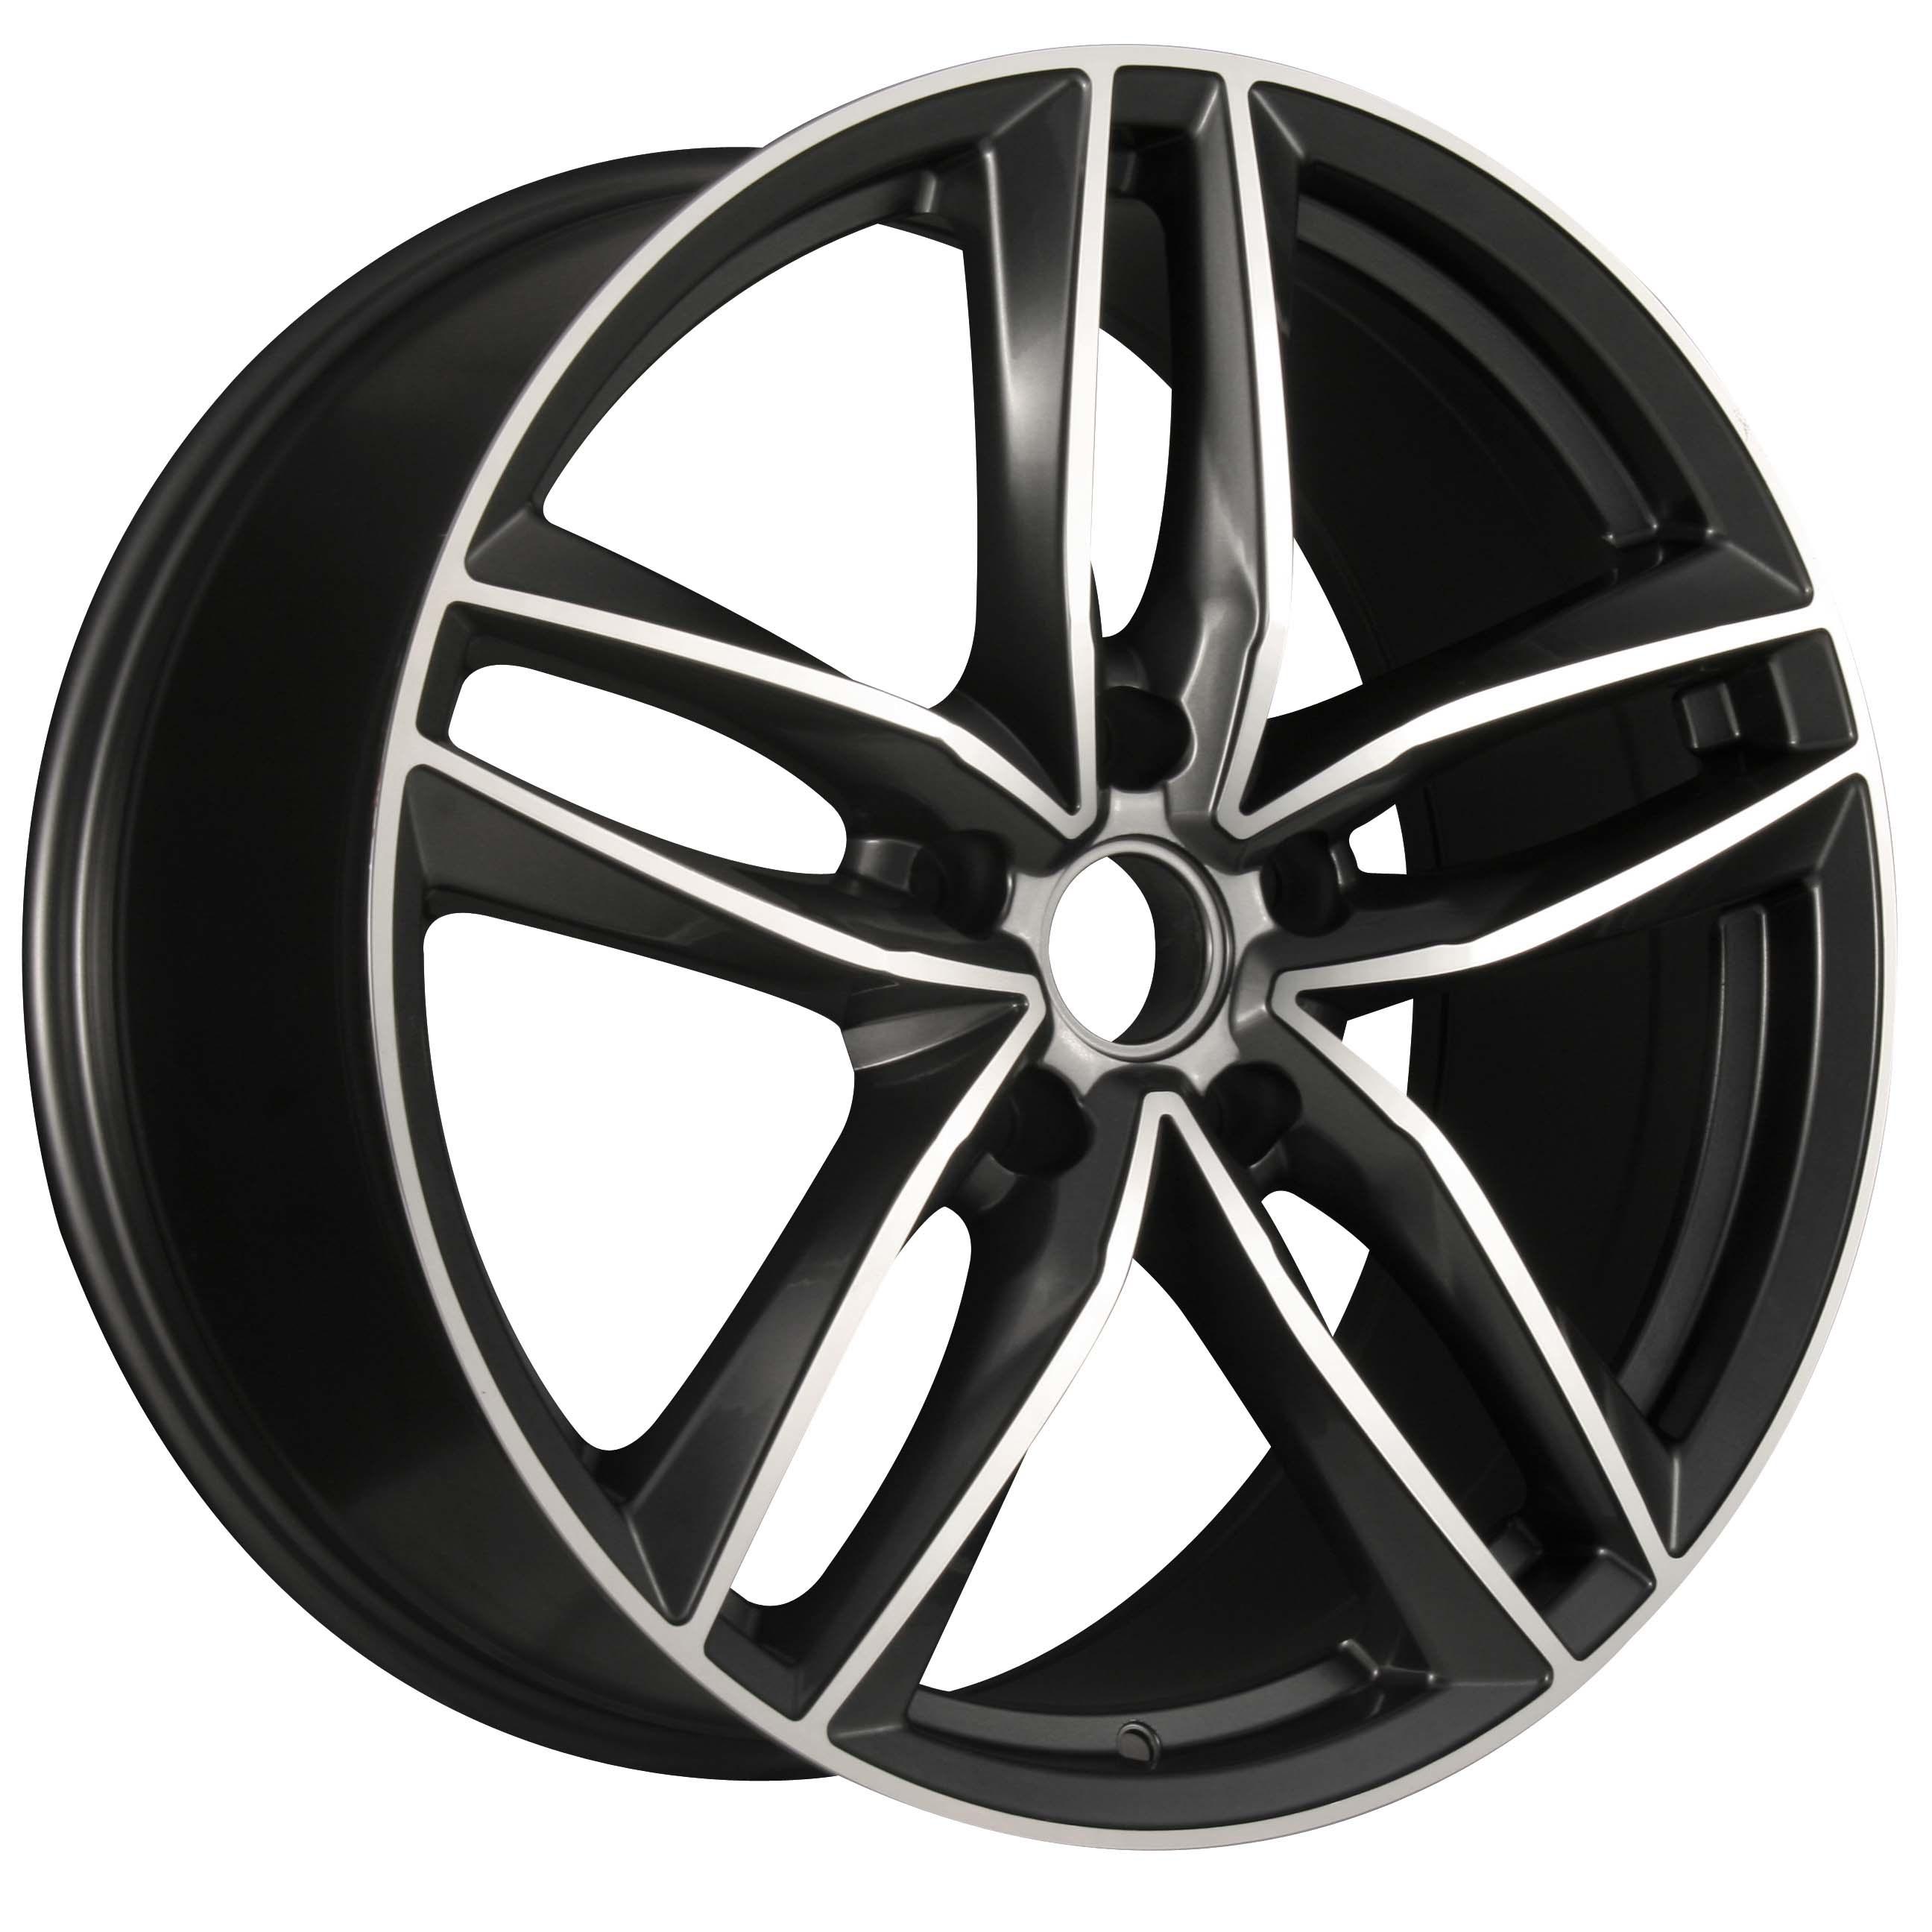 17inch-20inch Alloy Wheel Replica Wheel for Audi RS6